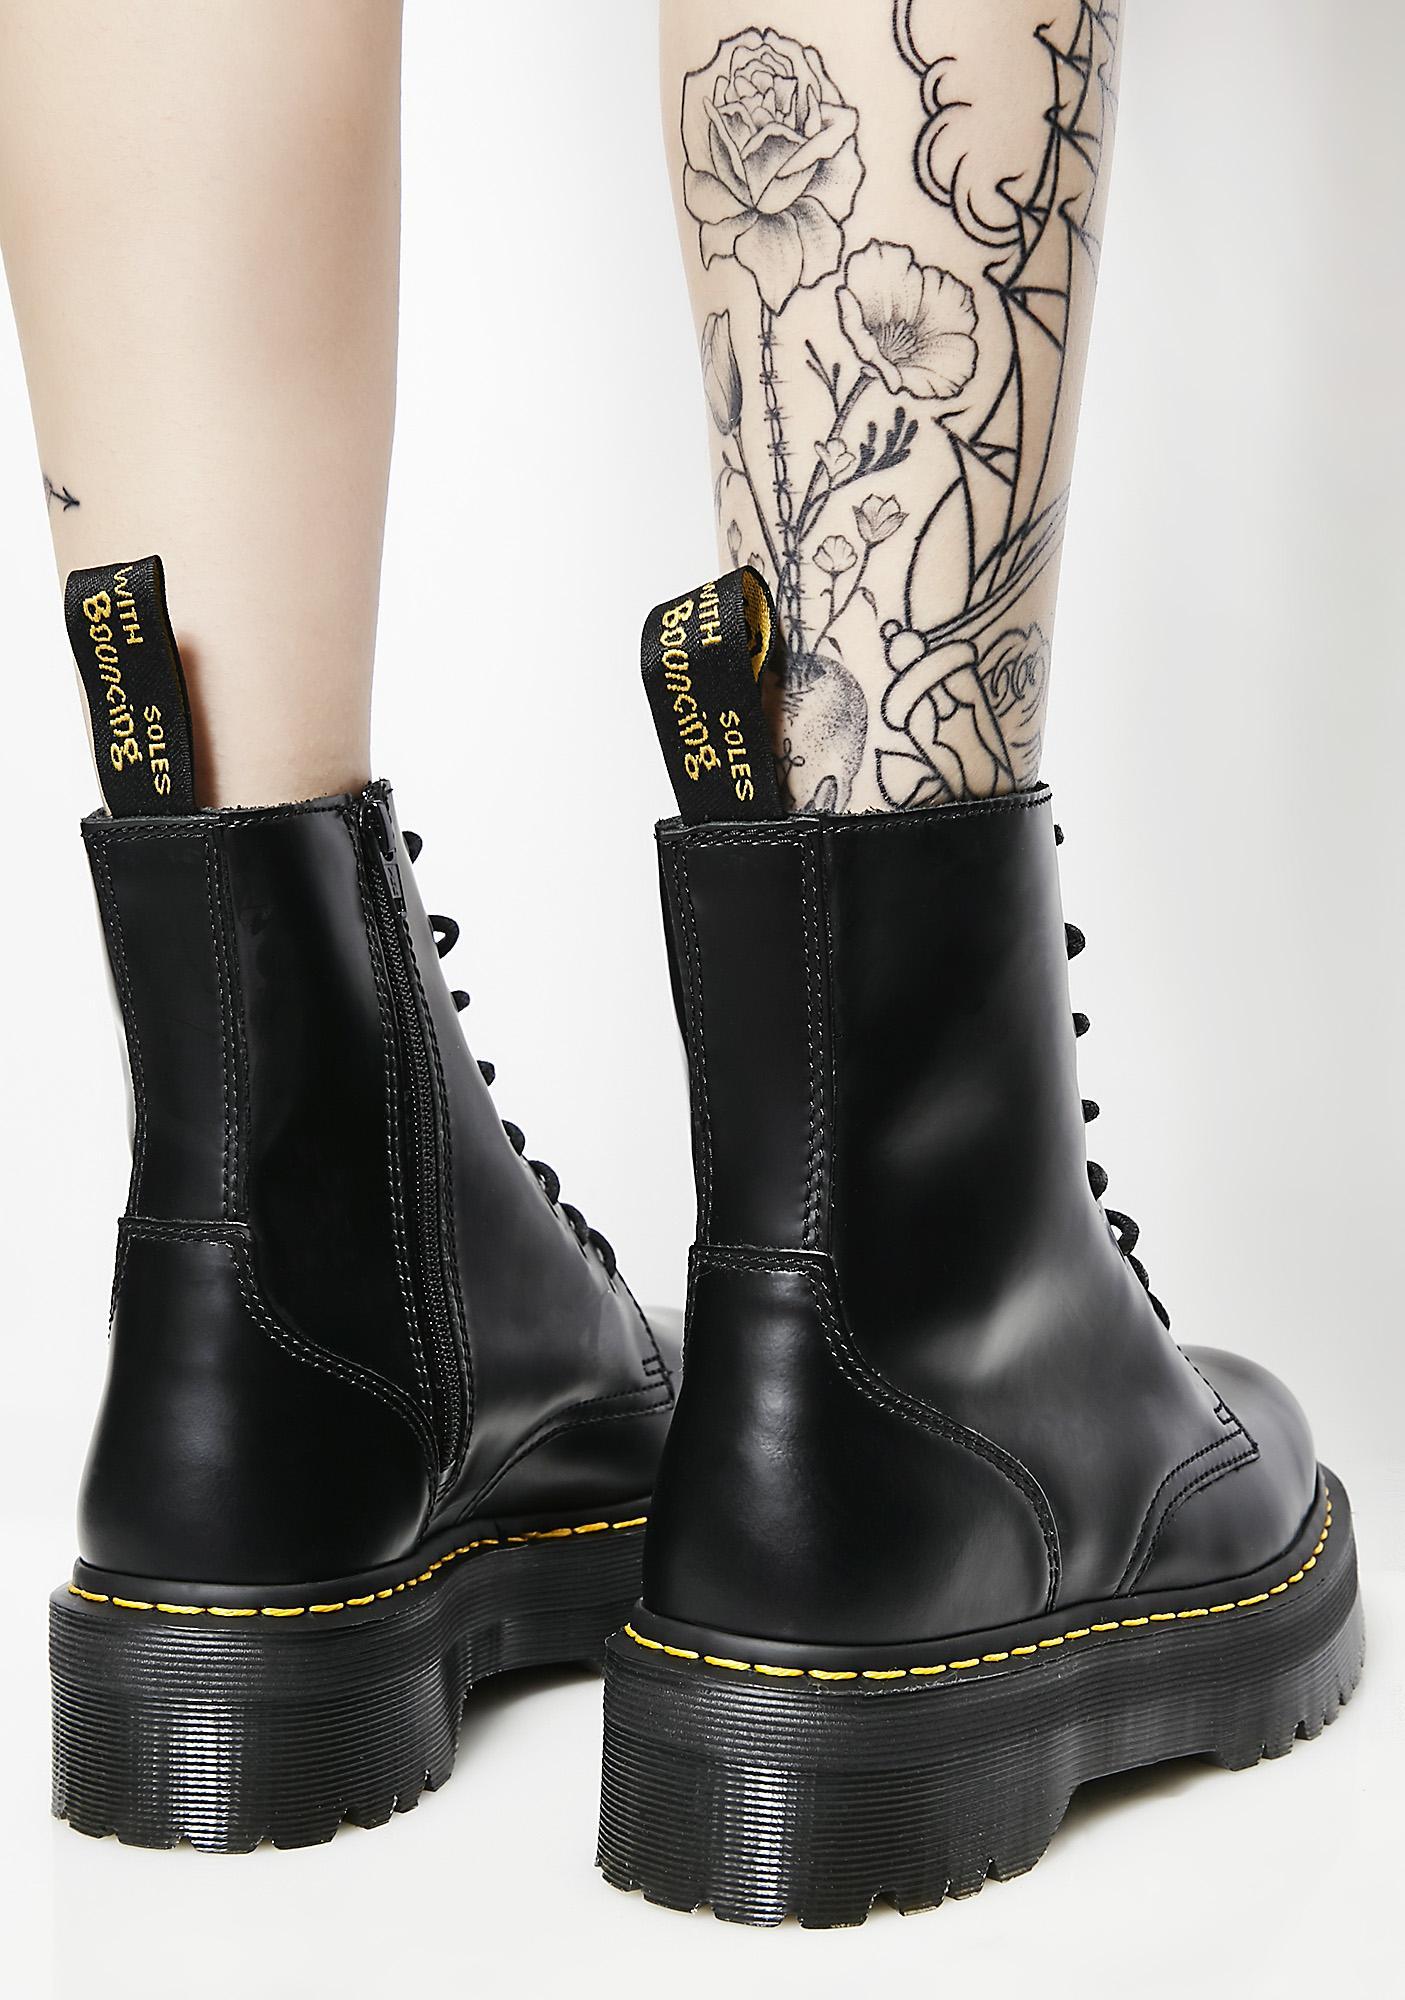 ... Dr. Martens Jadon 8 Eye Boots ... 216c456c307d0